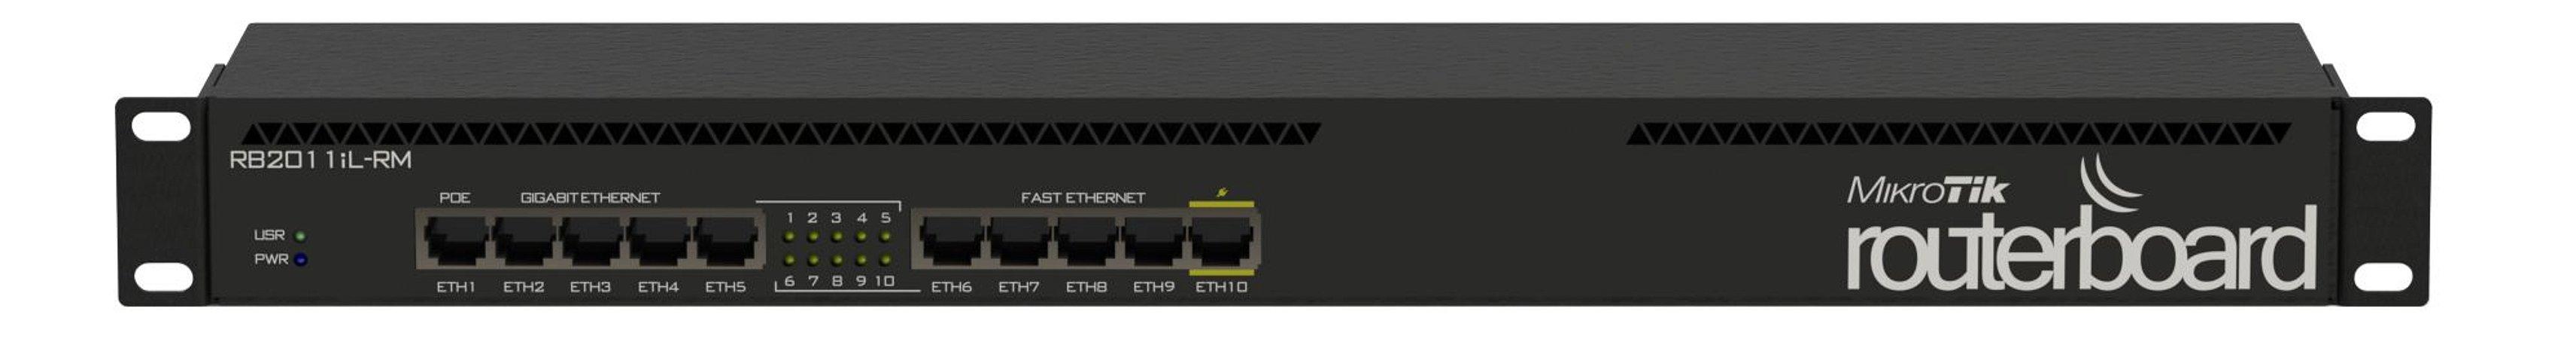 RB2011IL-RM - Roteador C/ 05 Portas FAST-ETHERNET, 05 PORTAS